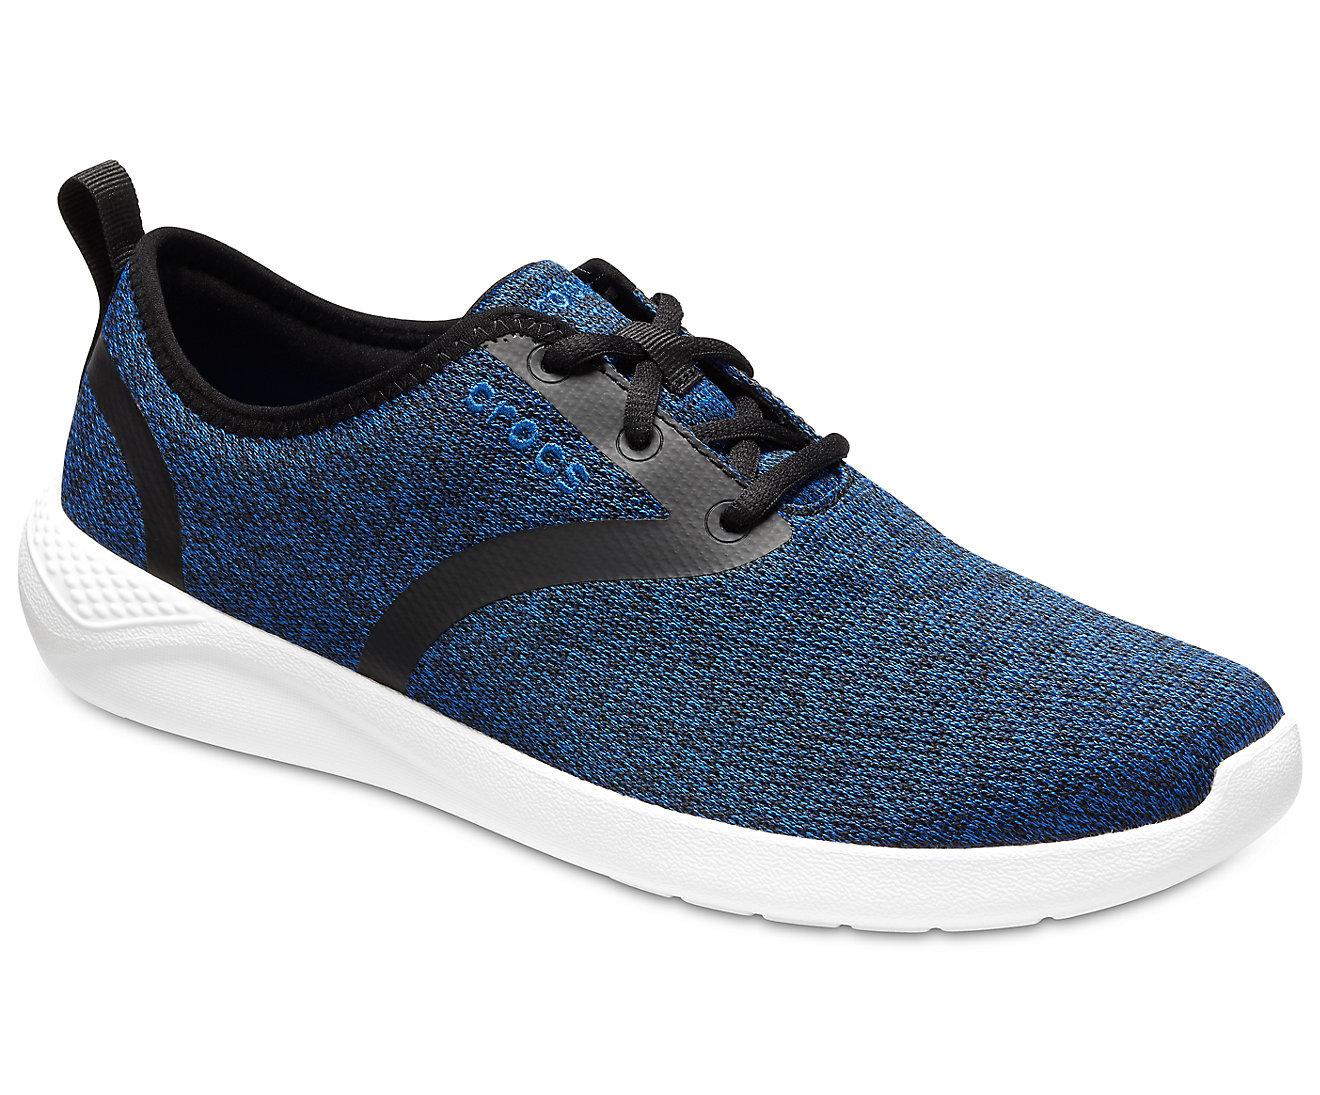 Кроссовки Crocs Men's LiteRide Lace-Up Синие